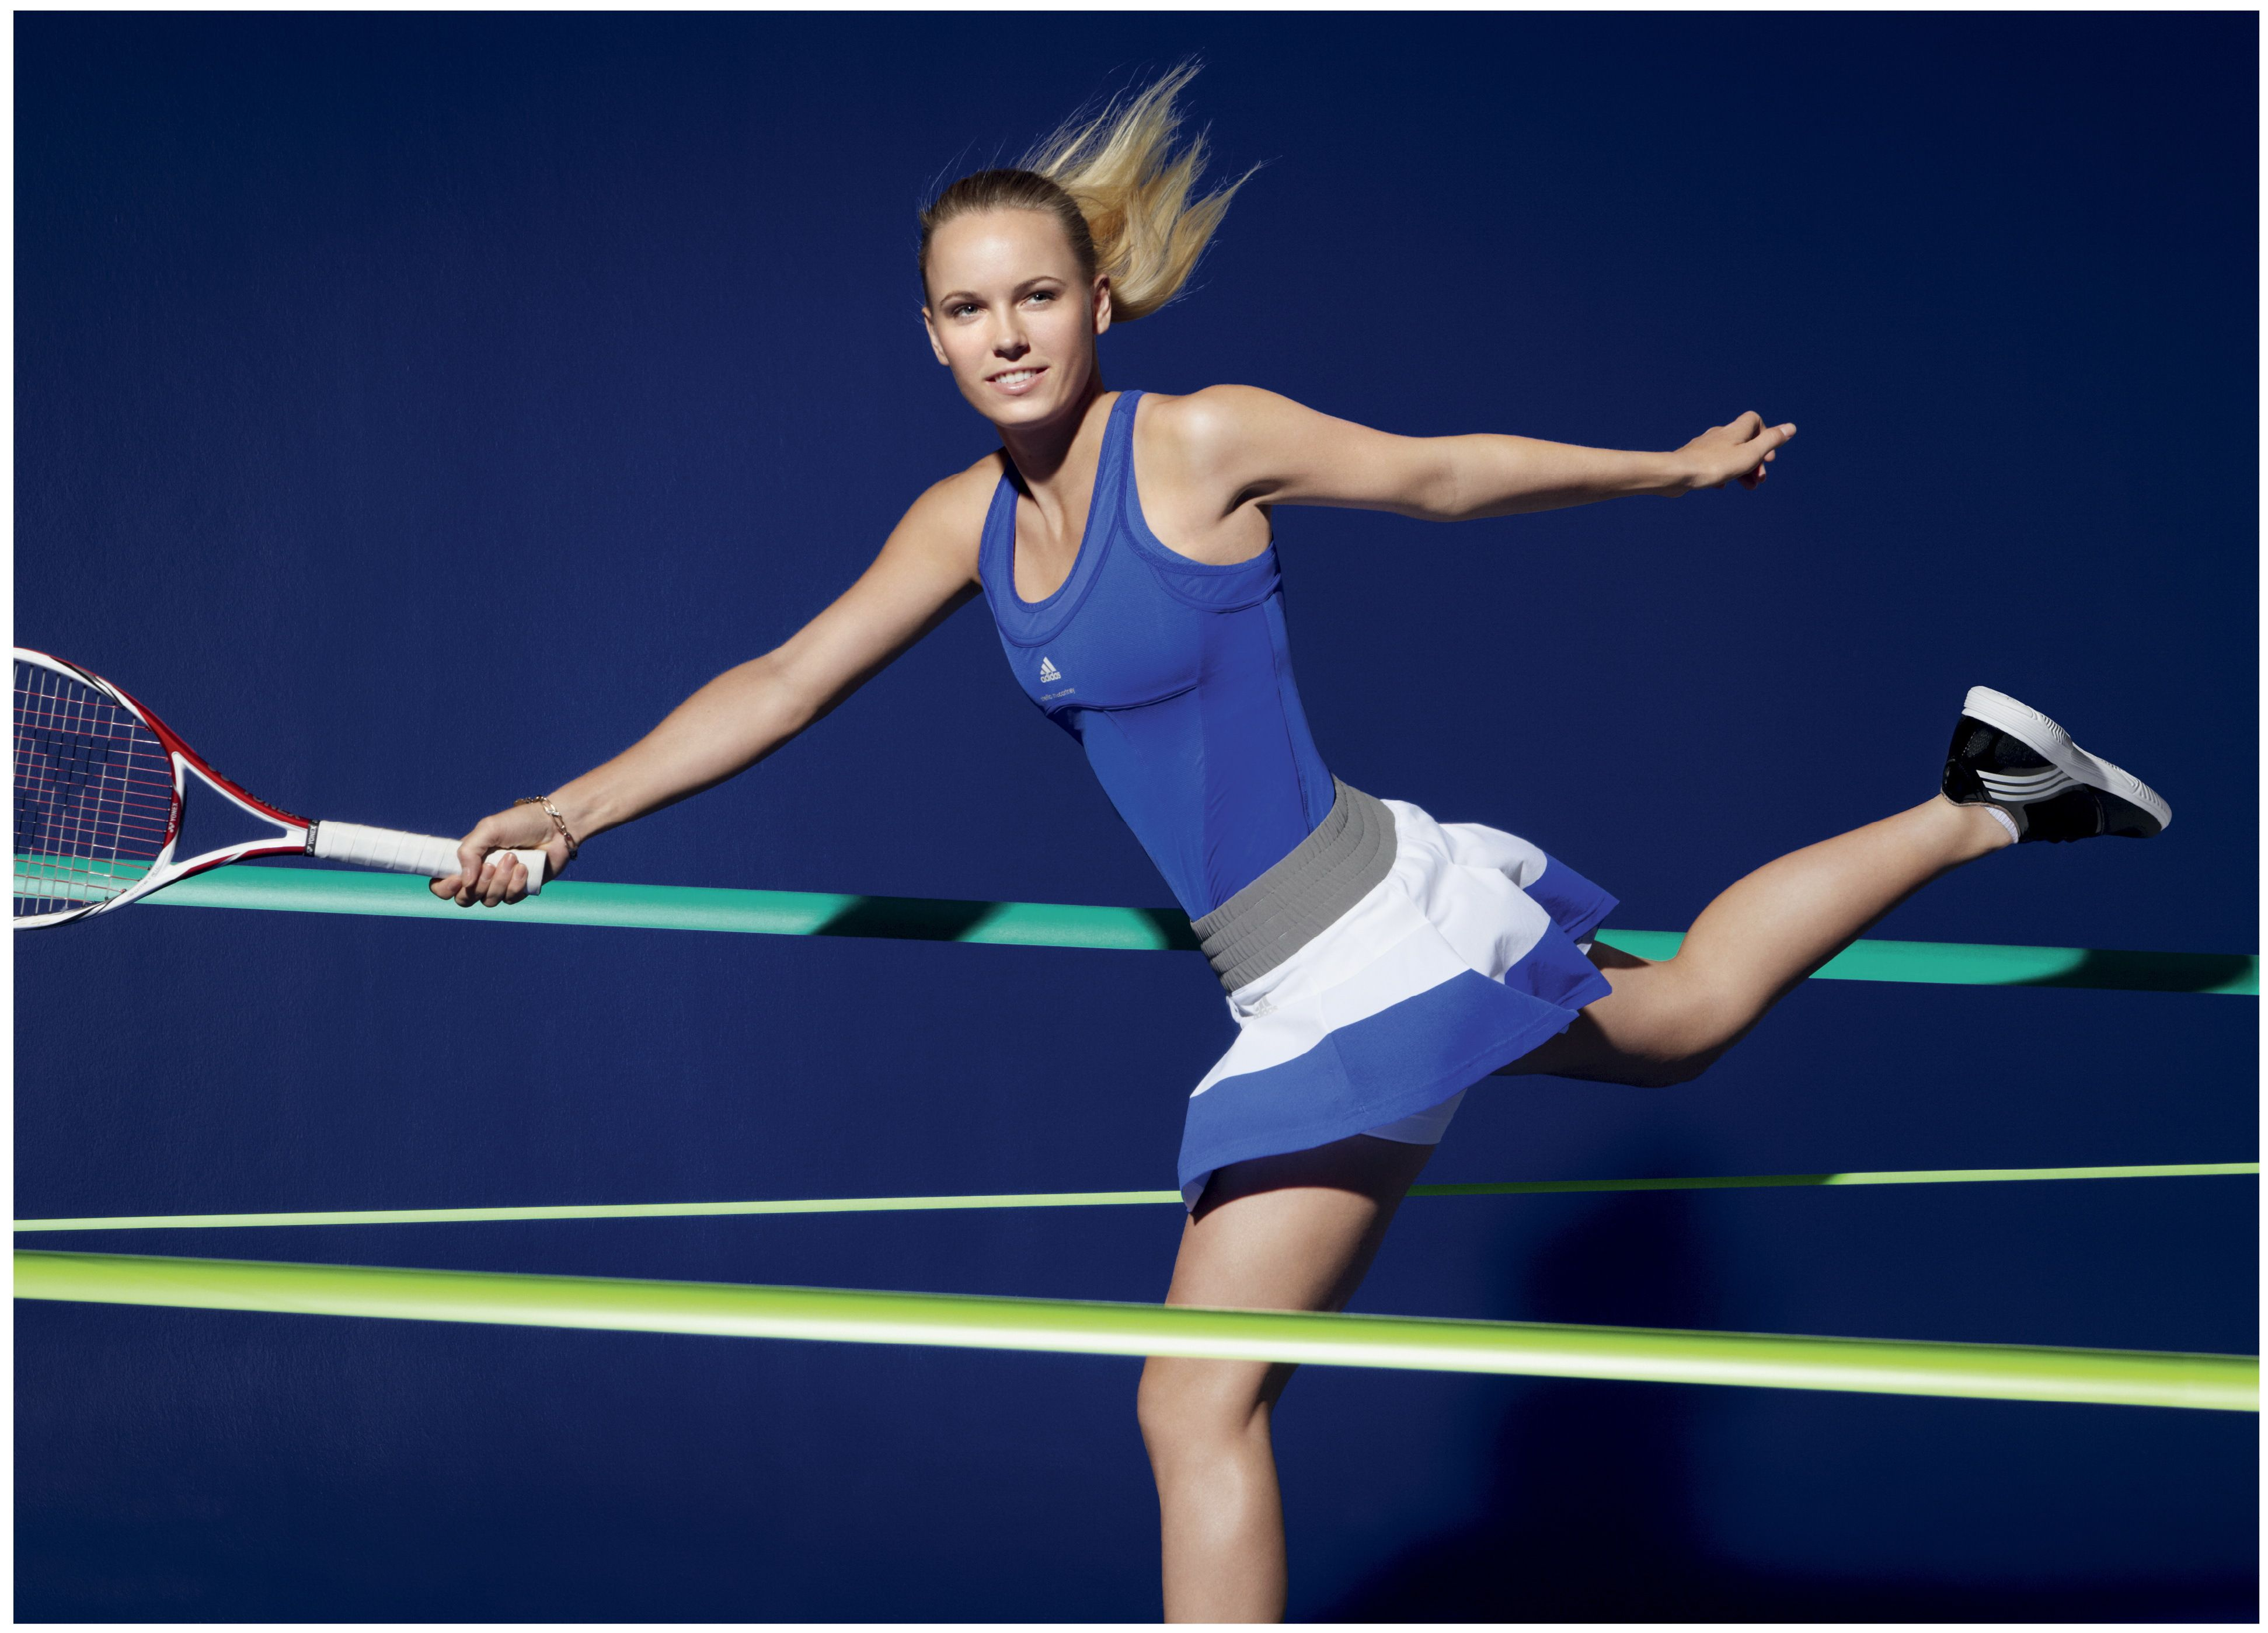 adidas tennis clothing (apparel) buy online | Tennis Point